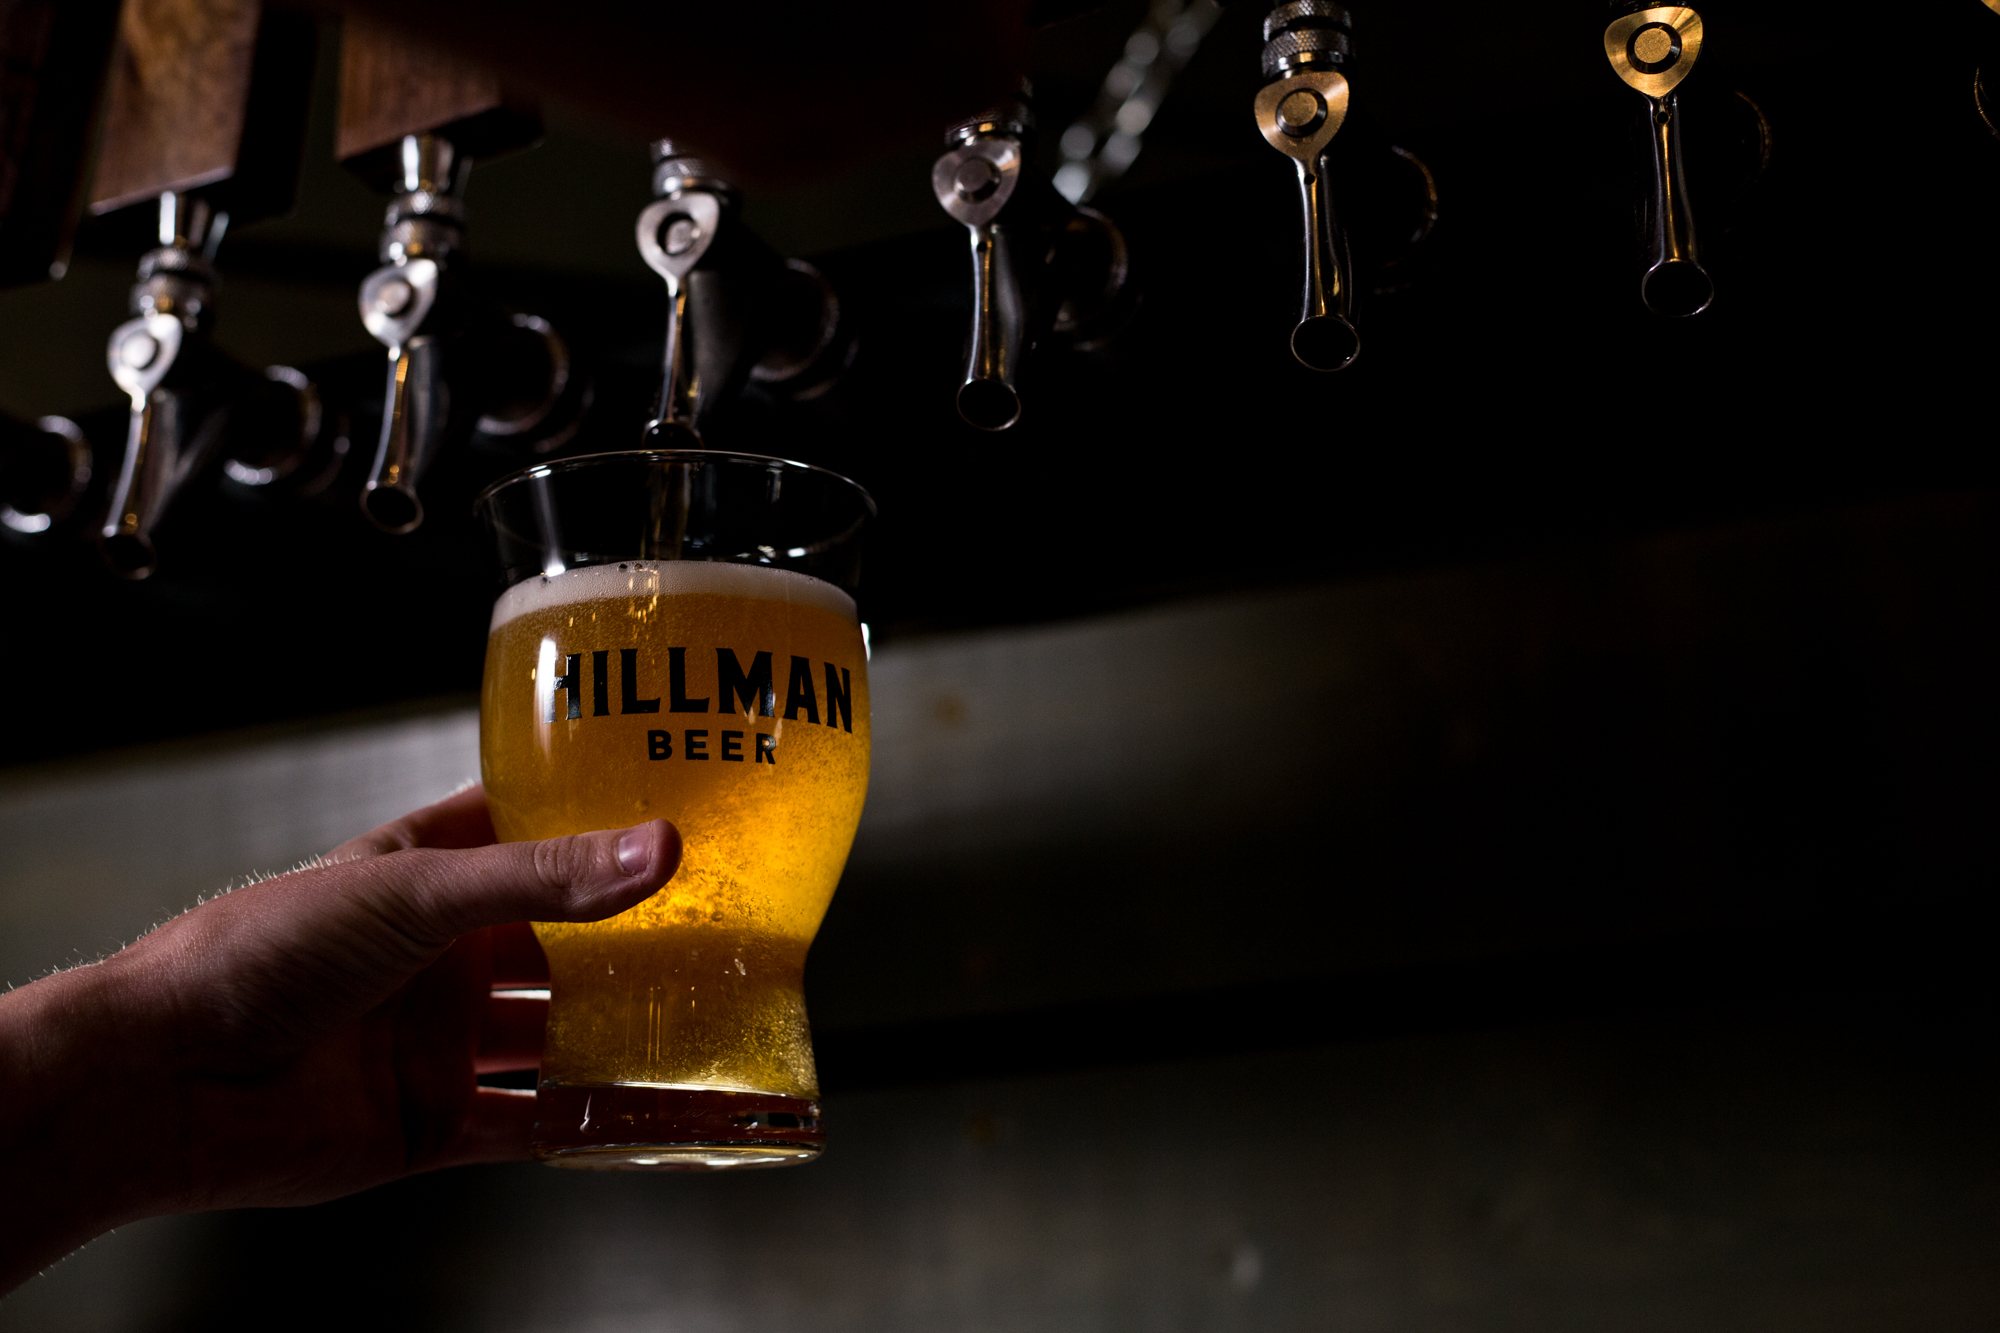 Hillman Beer - West Ashe - Asheville, NC